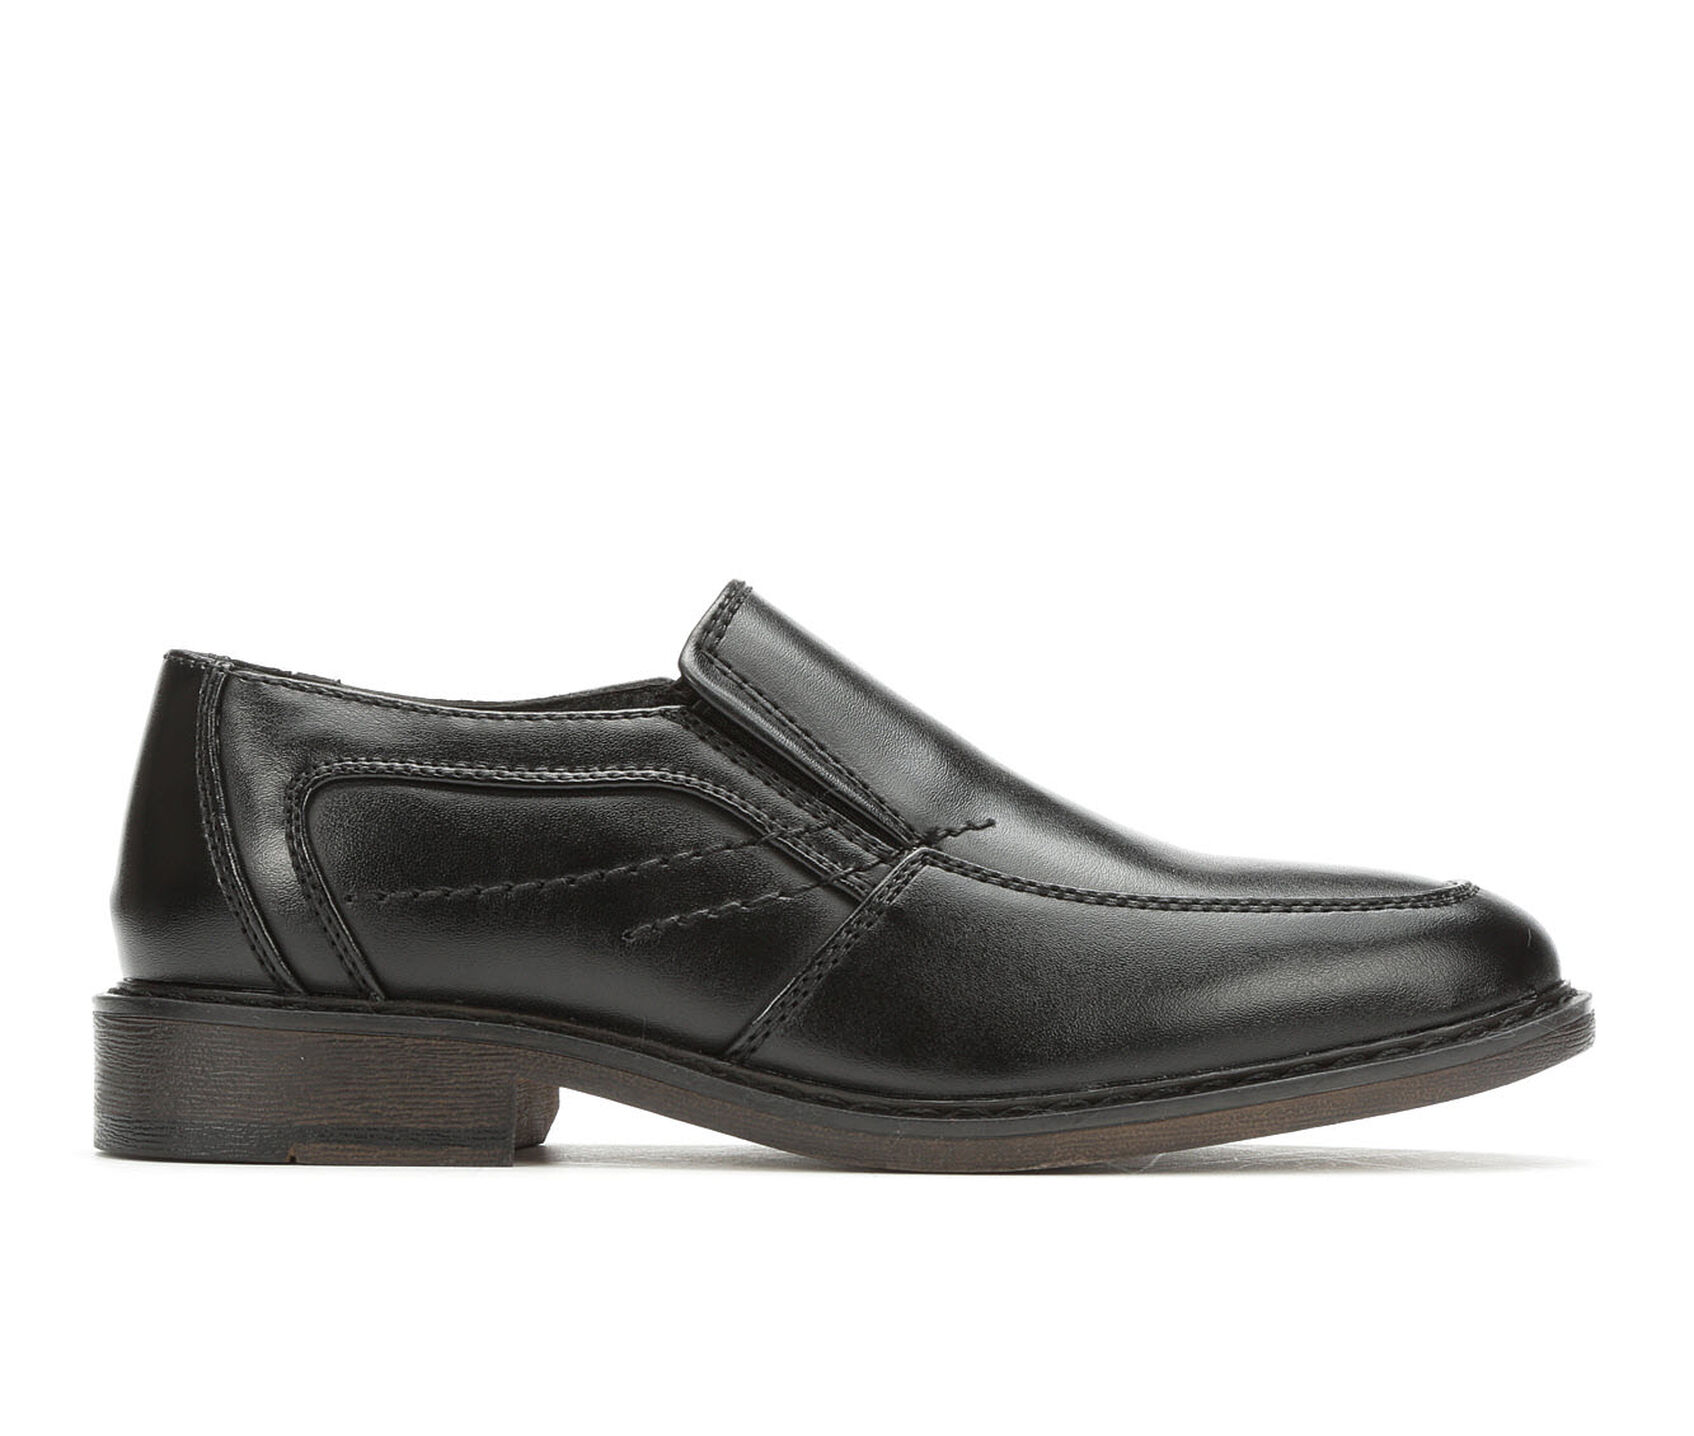 42c715f7fa7 ... Madison Ave. Little Kid  amp  Big Kid Jax Dress Loafers. Previous